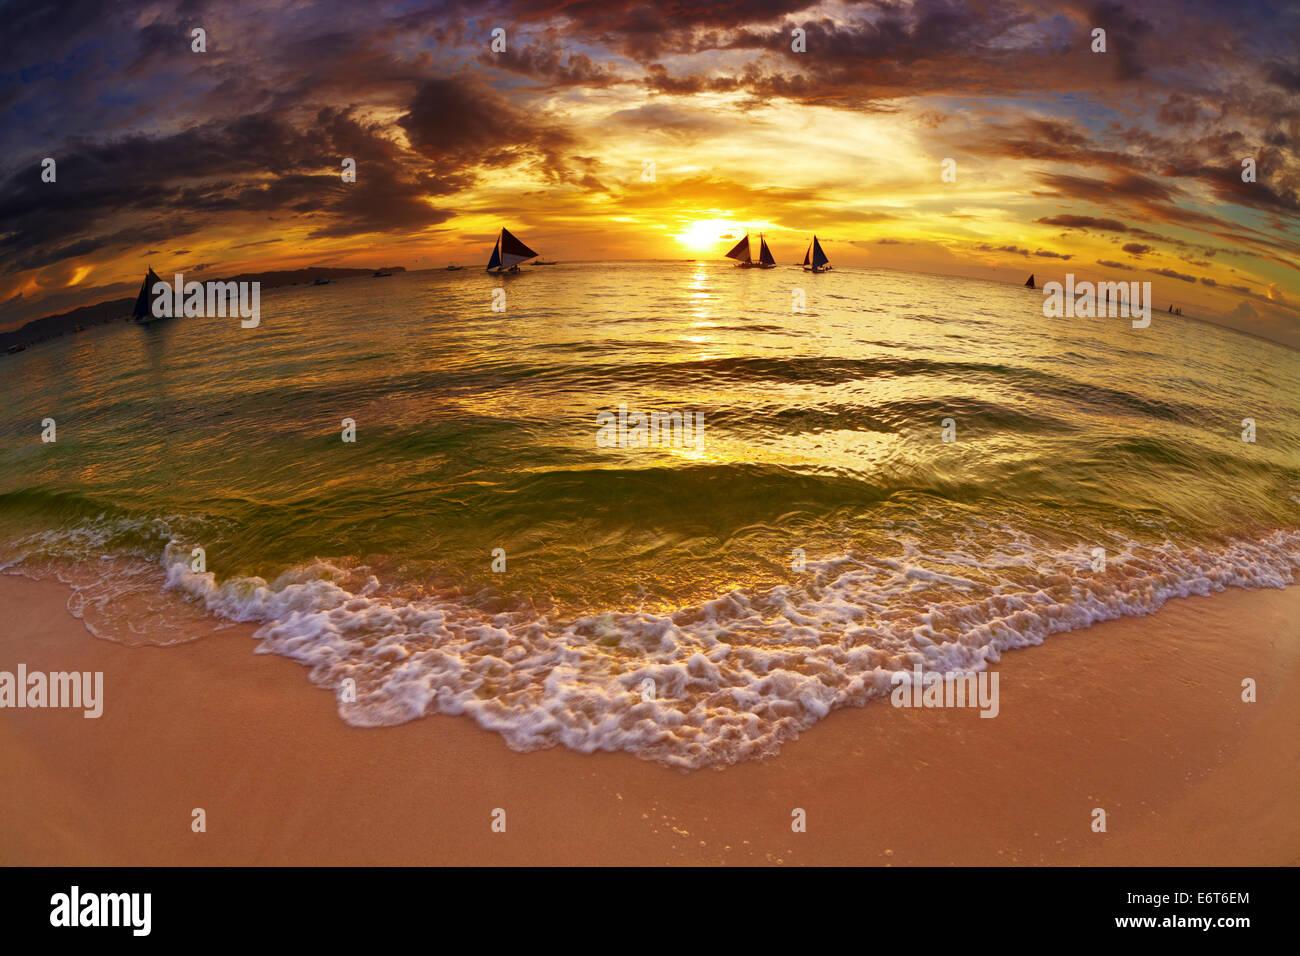 Spiaggia tropicale al tramonto, Boracay Island, Filippine, fisheye shot Immagini Stock